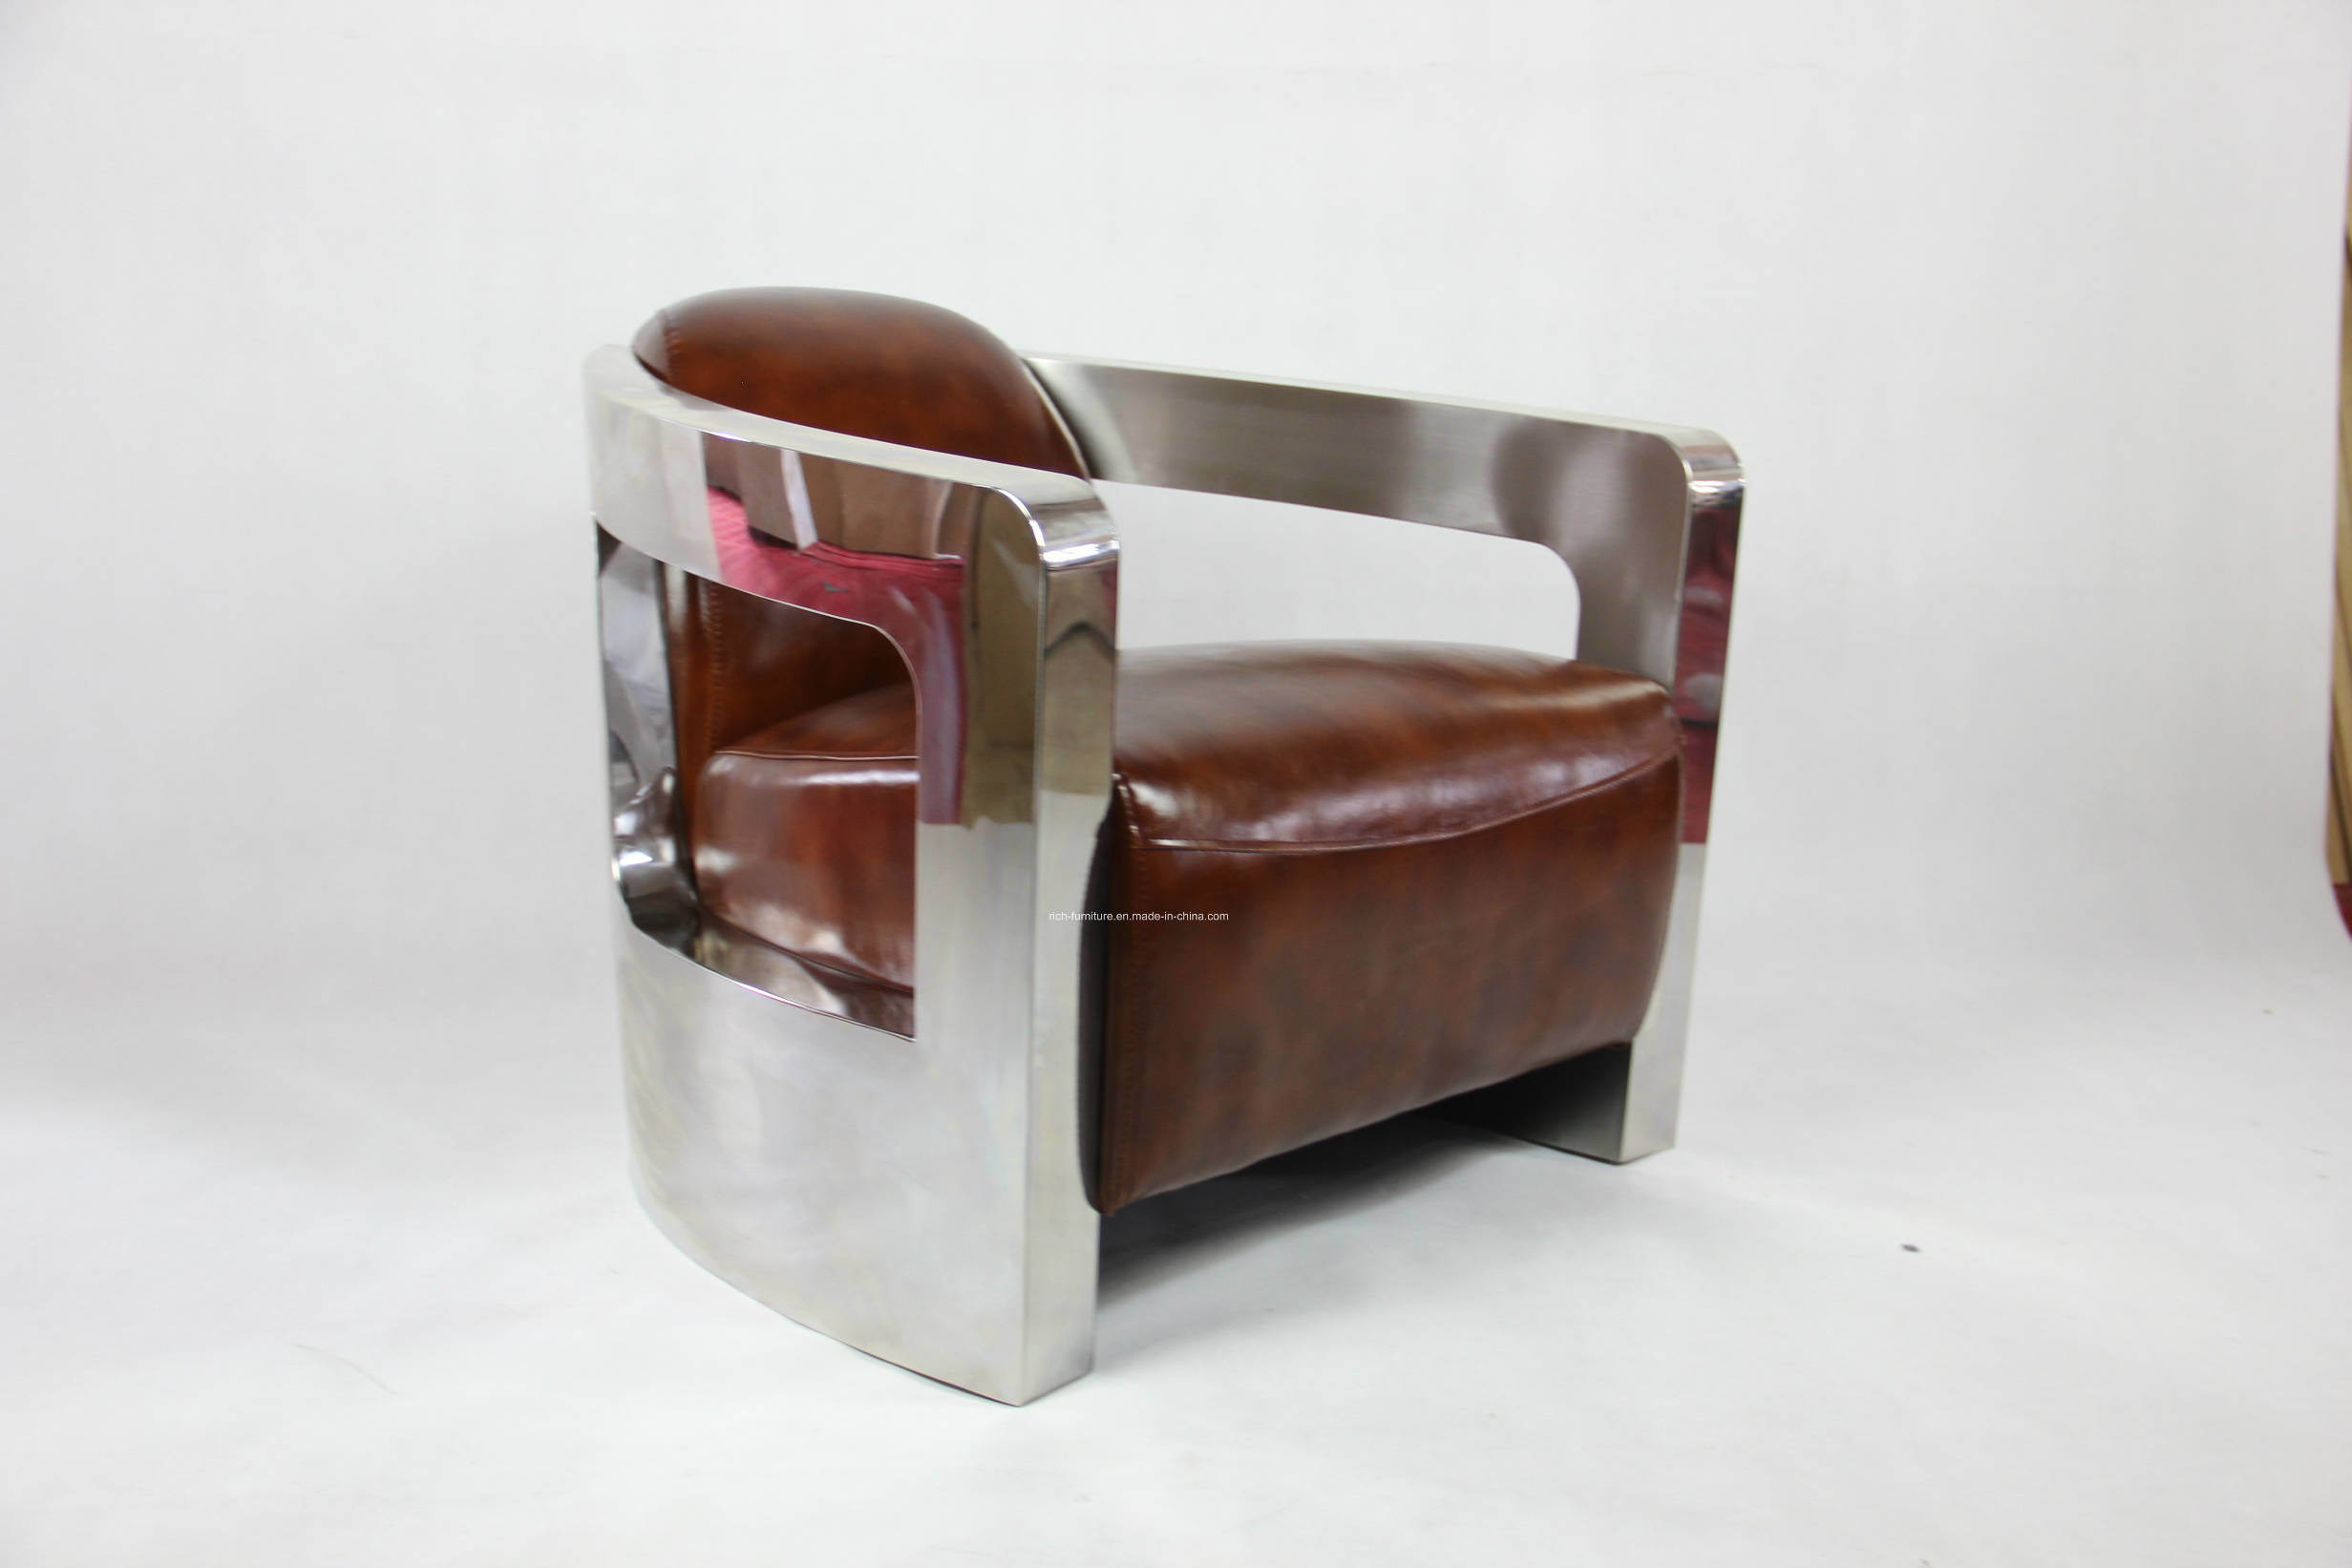 Aviator Spitfire Aluminum Range Rich Furniture Co Ltd page 1